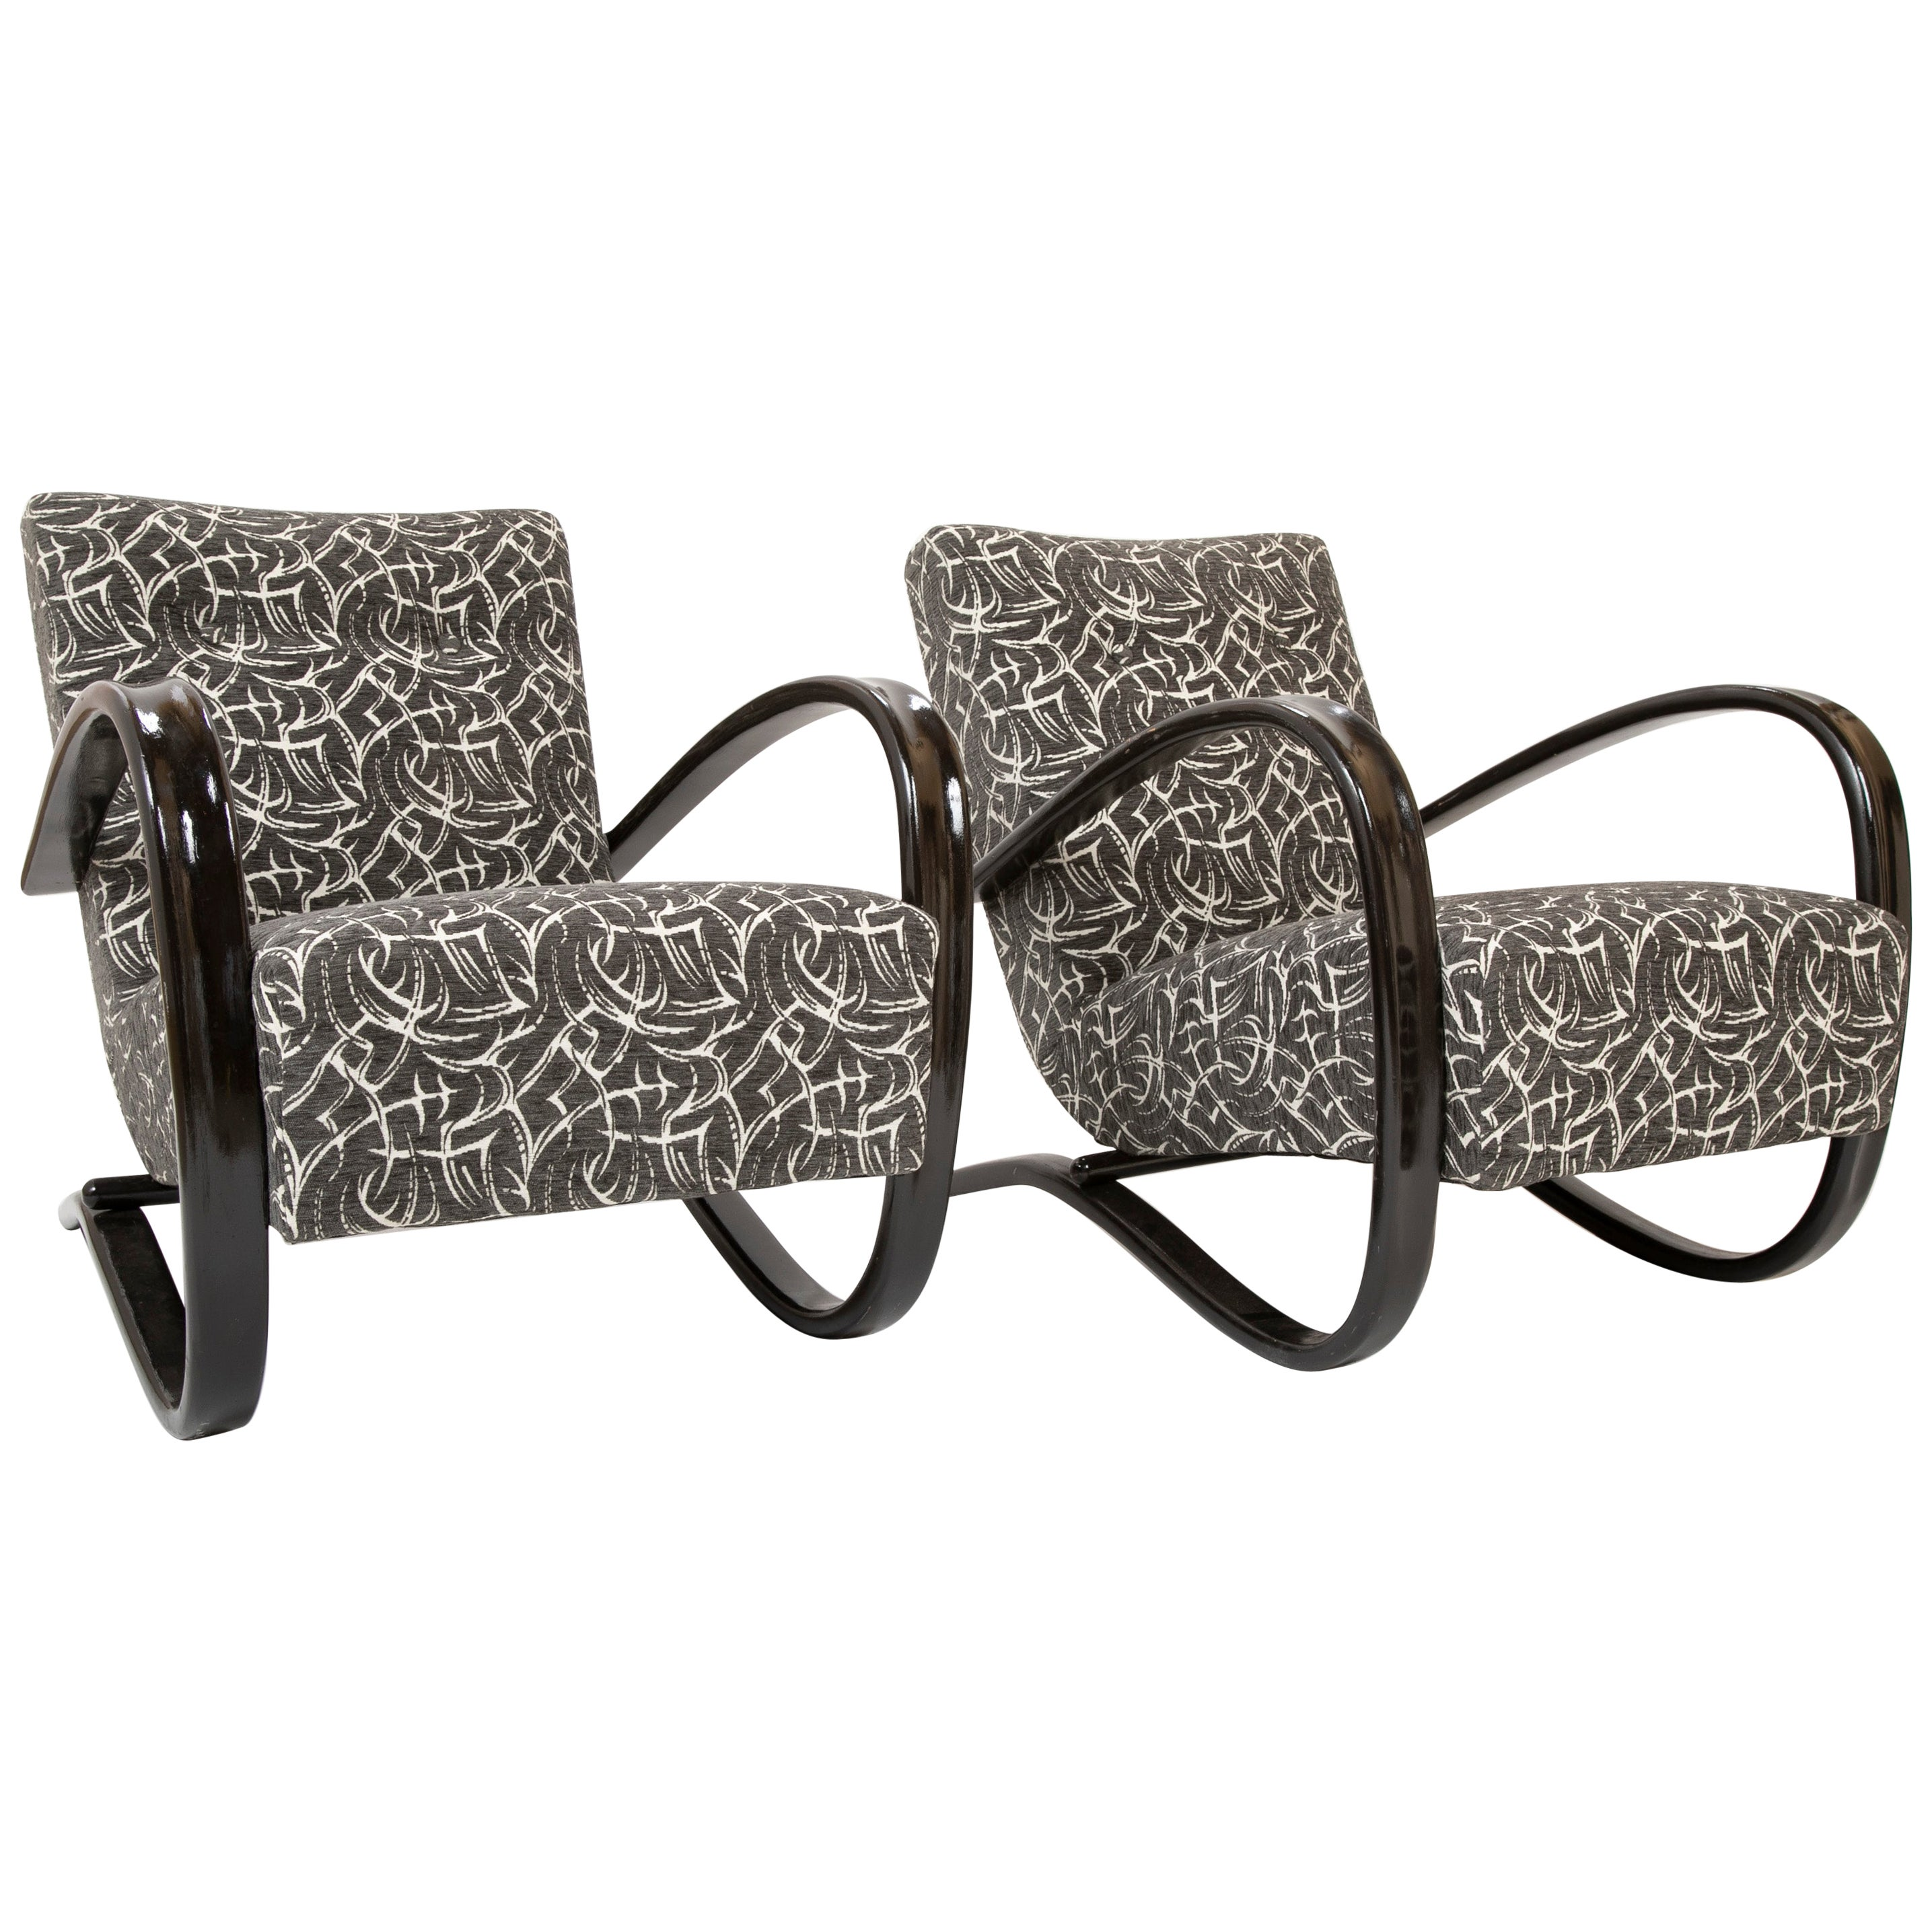 Pair of Halabala Chairs Designed by Jindrich Halabala